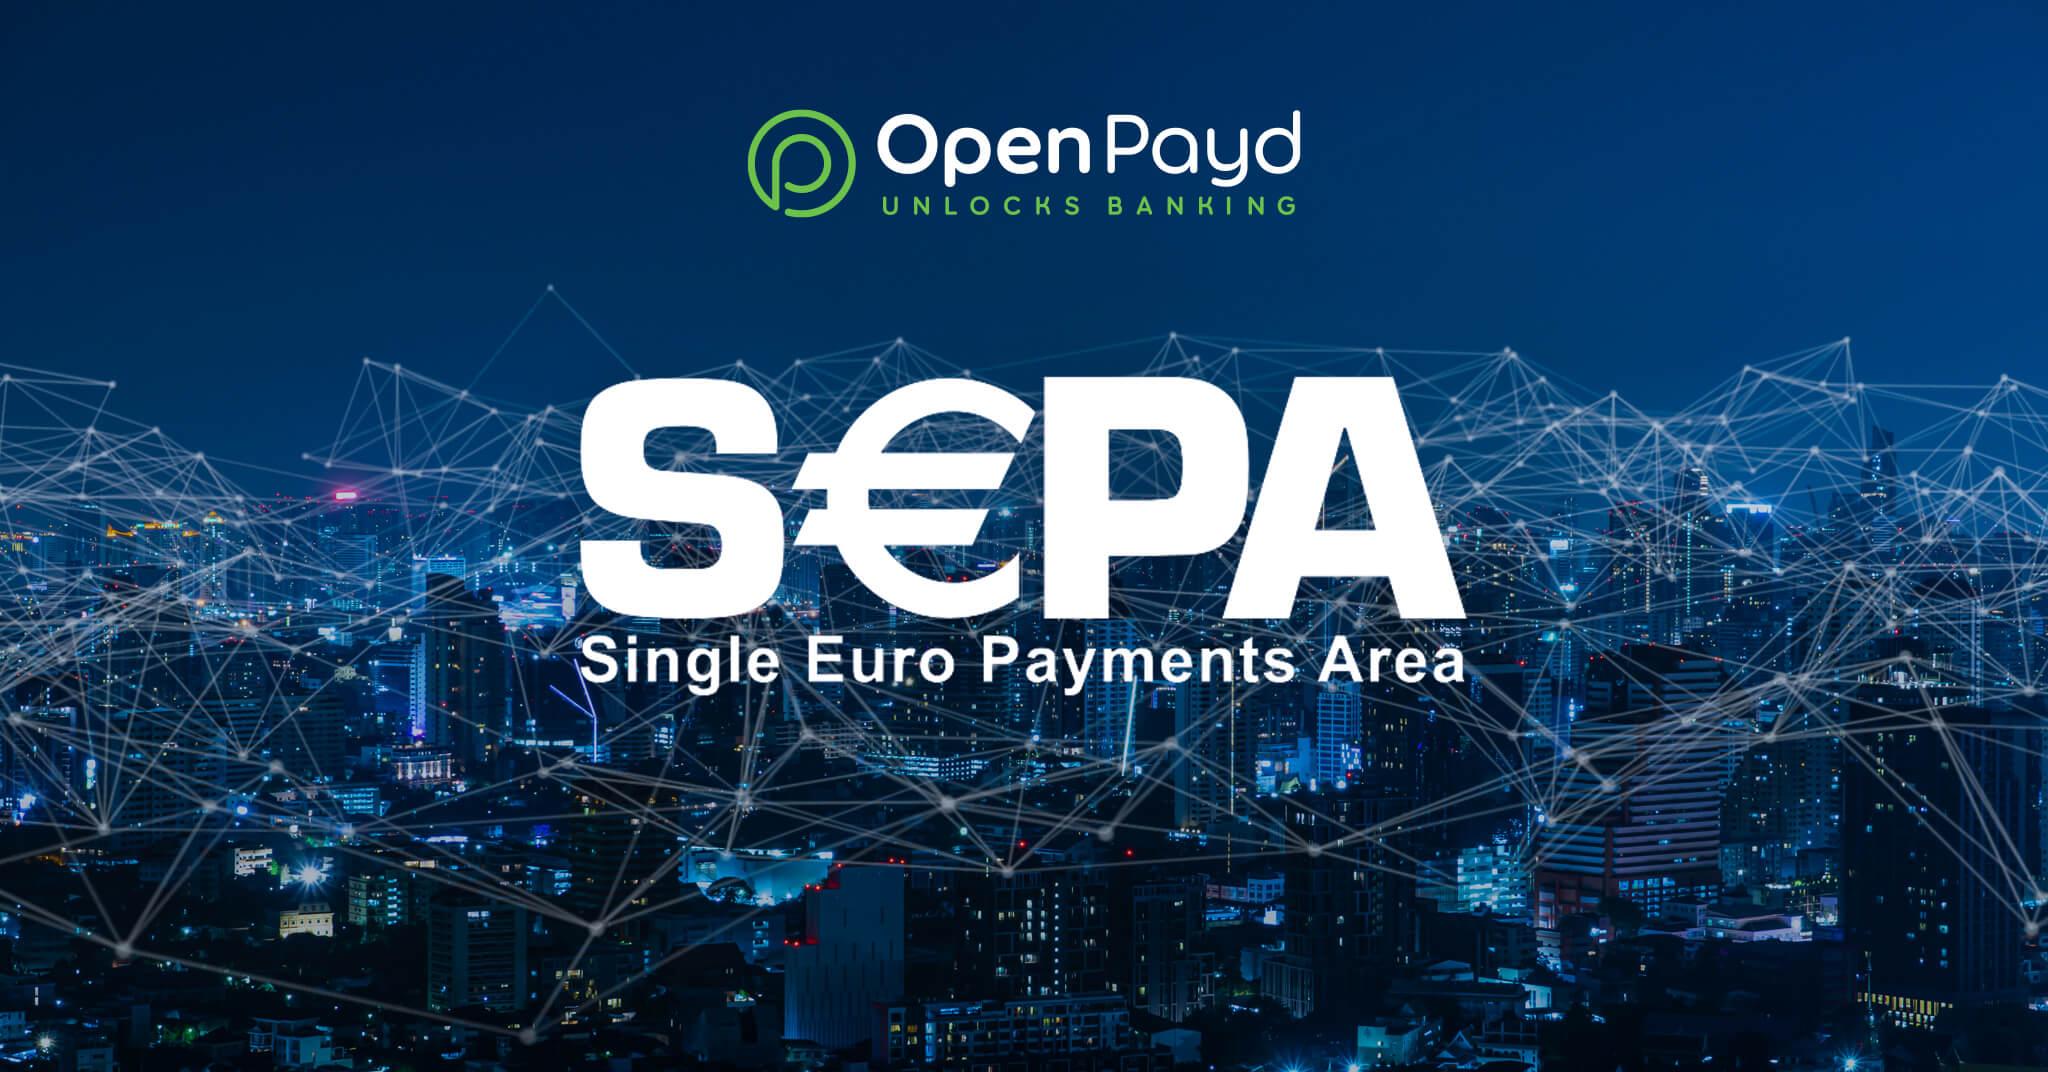 OpenPayd enhances its SEPA capabilities